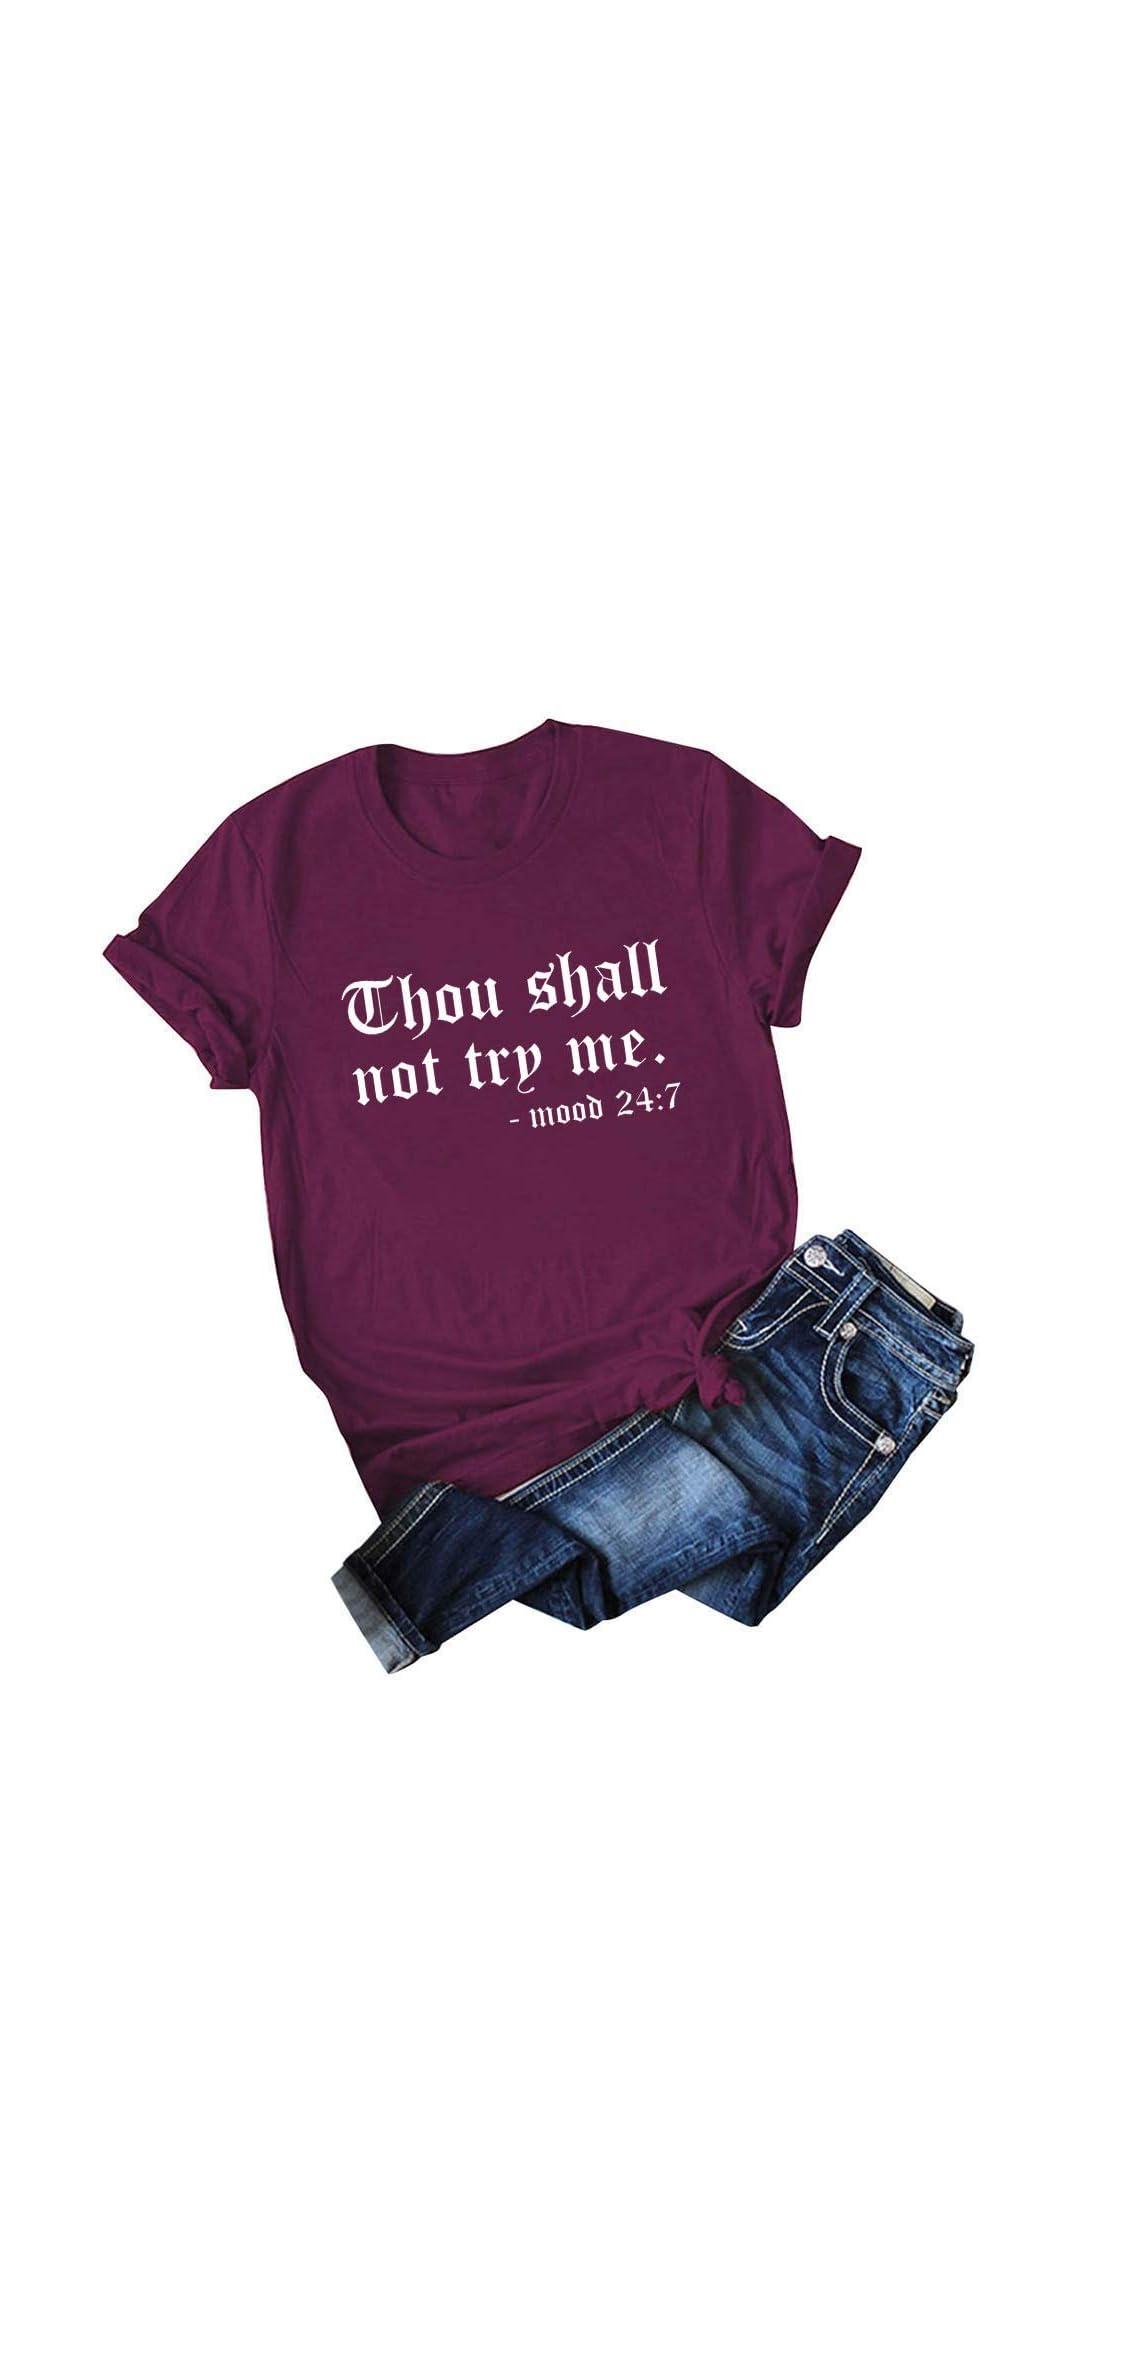 Plus Size Shirt For Women Fashion Casual O-neck Tee